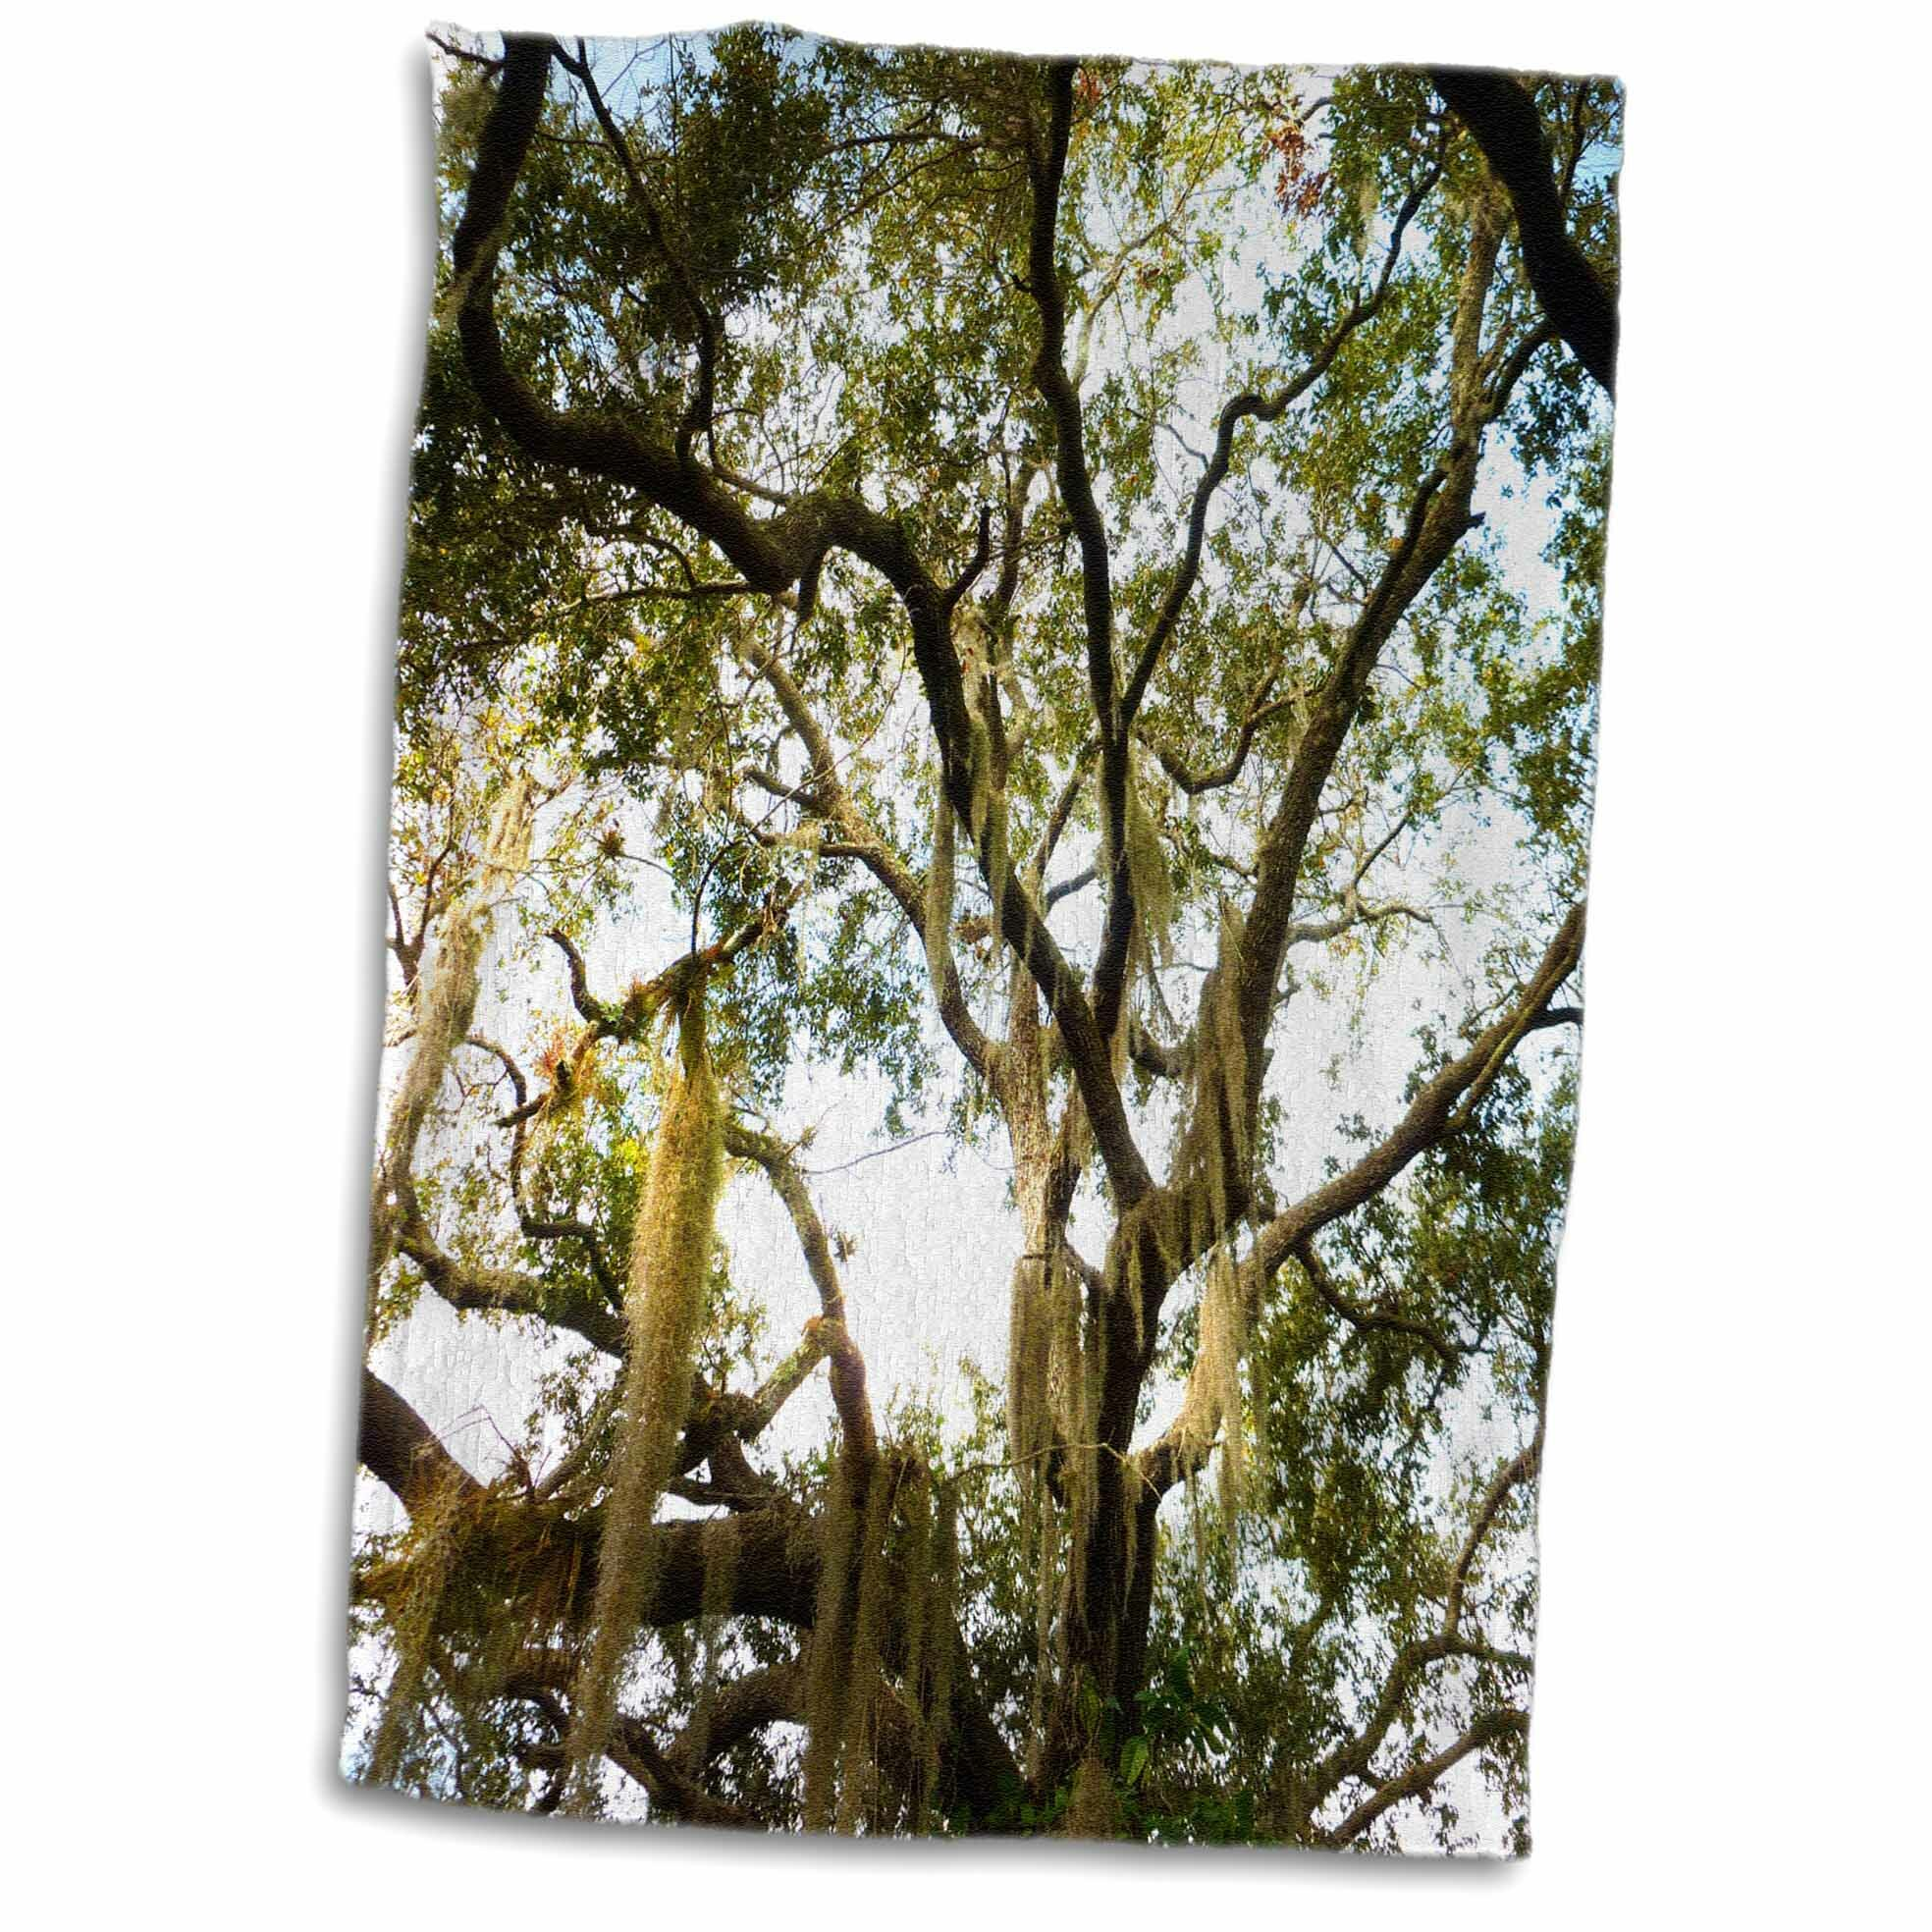 East Urban Home Hendrix Live Oak Old Tree Branches Spanish Moss 3d Hand Towel Wayfair